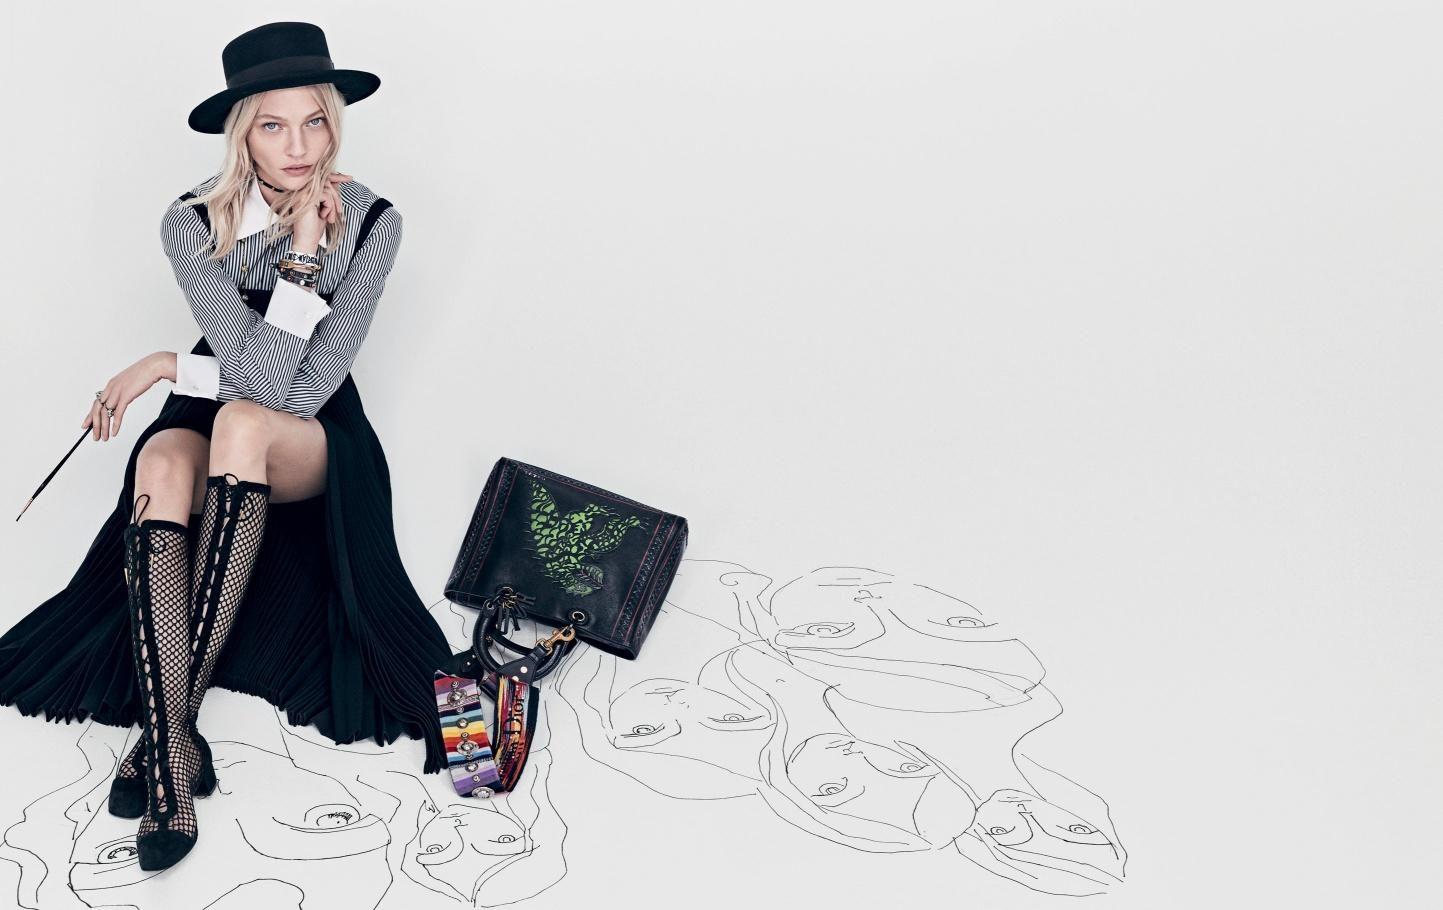 Dior2018SS成衣系列广告大片,国际超模Sasha Pivovarova完美演绎 - AnaCoppla - AnaCoppla